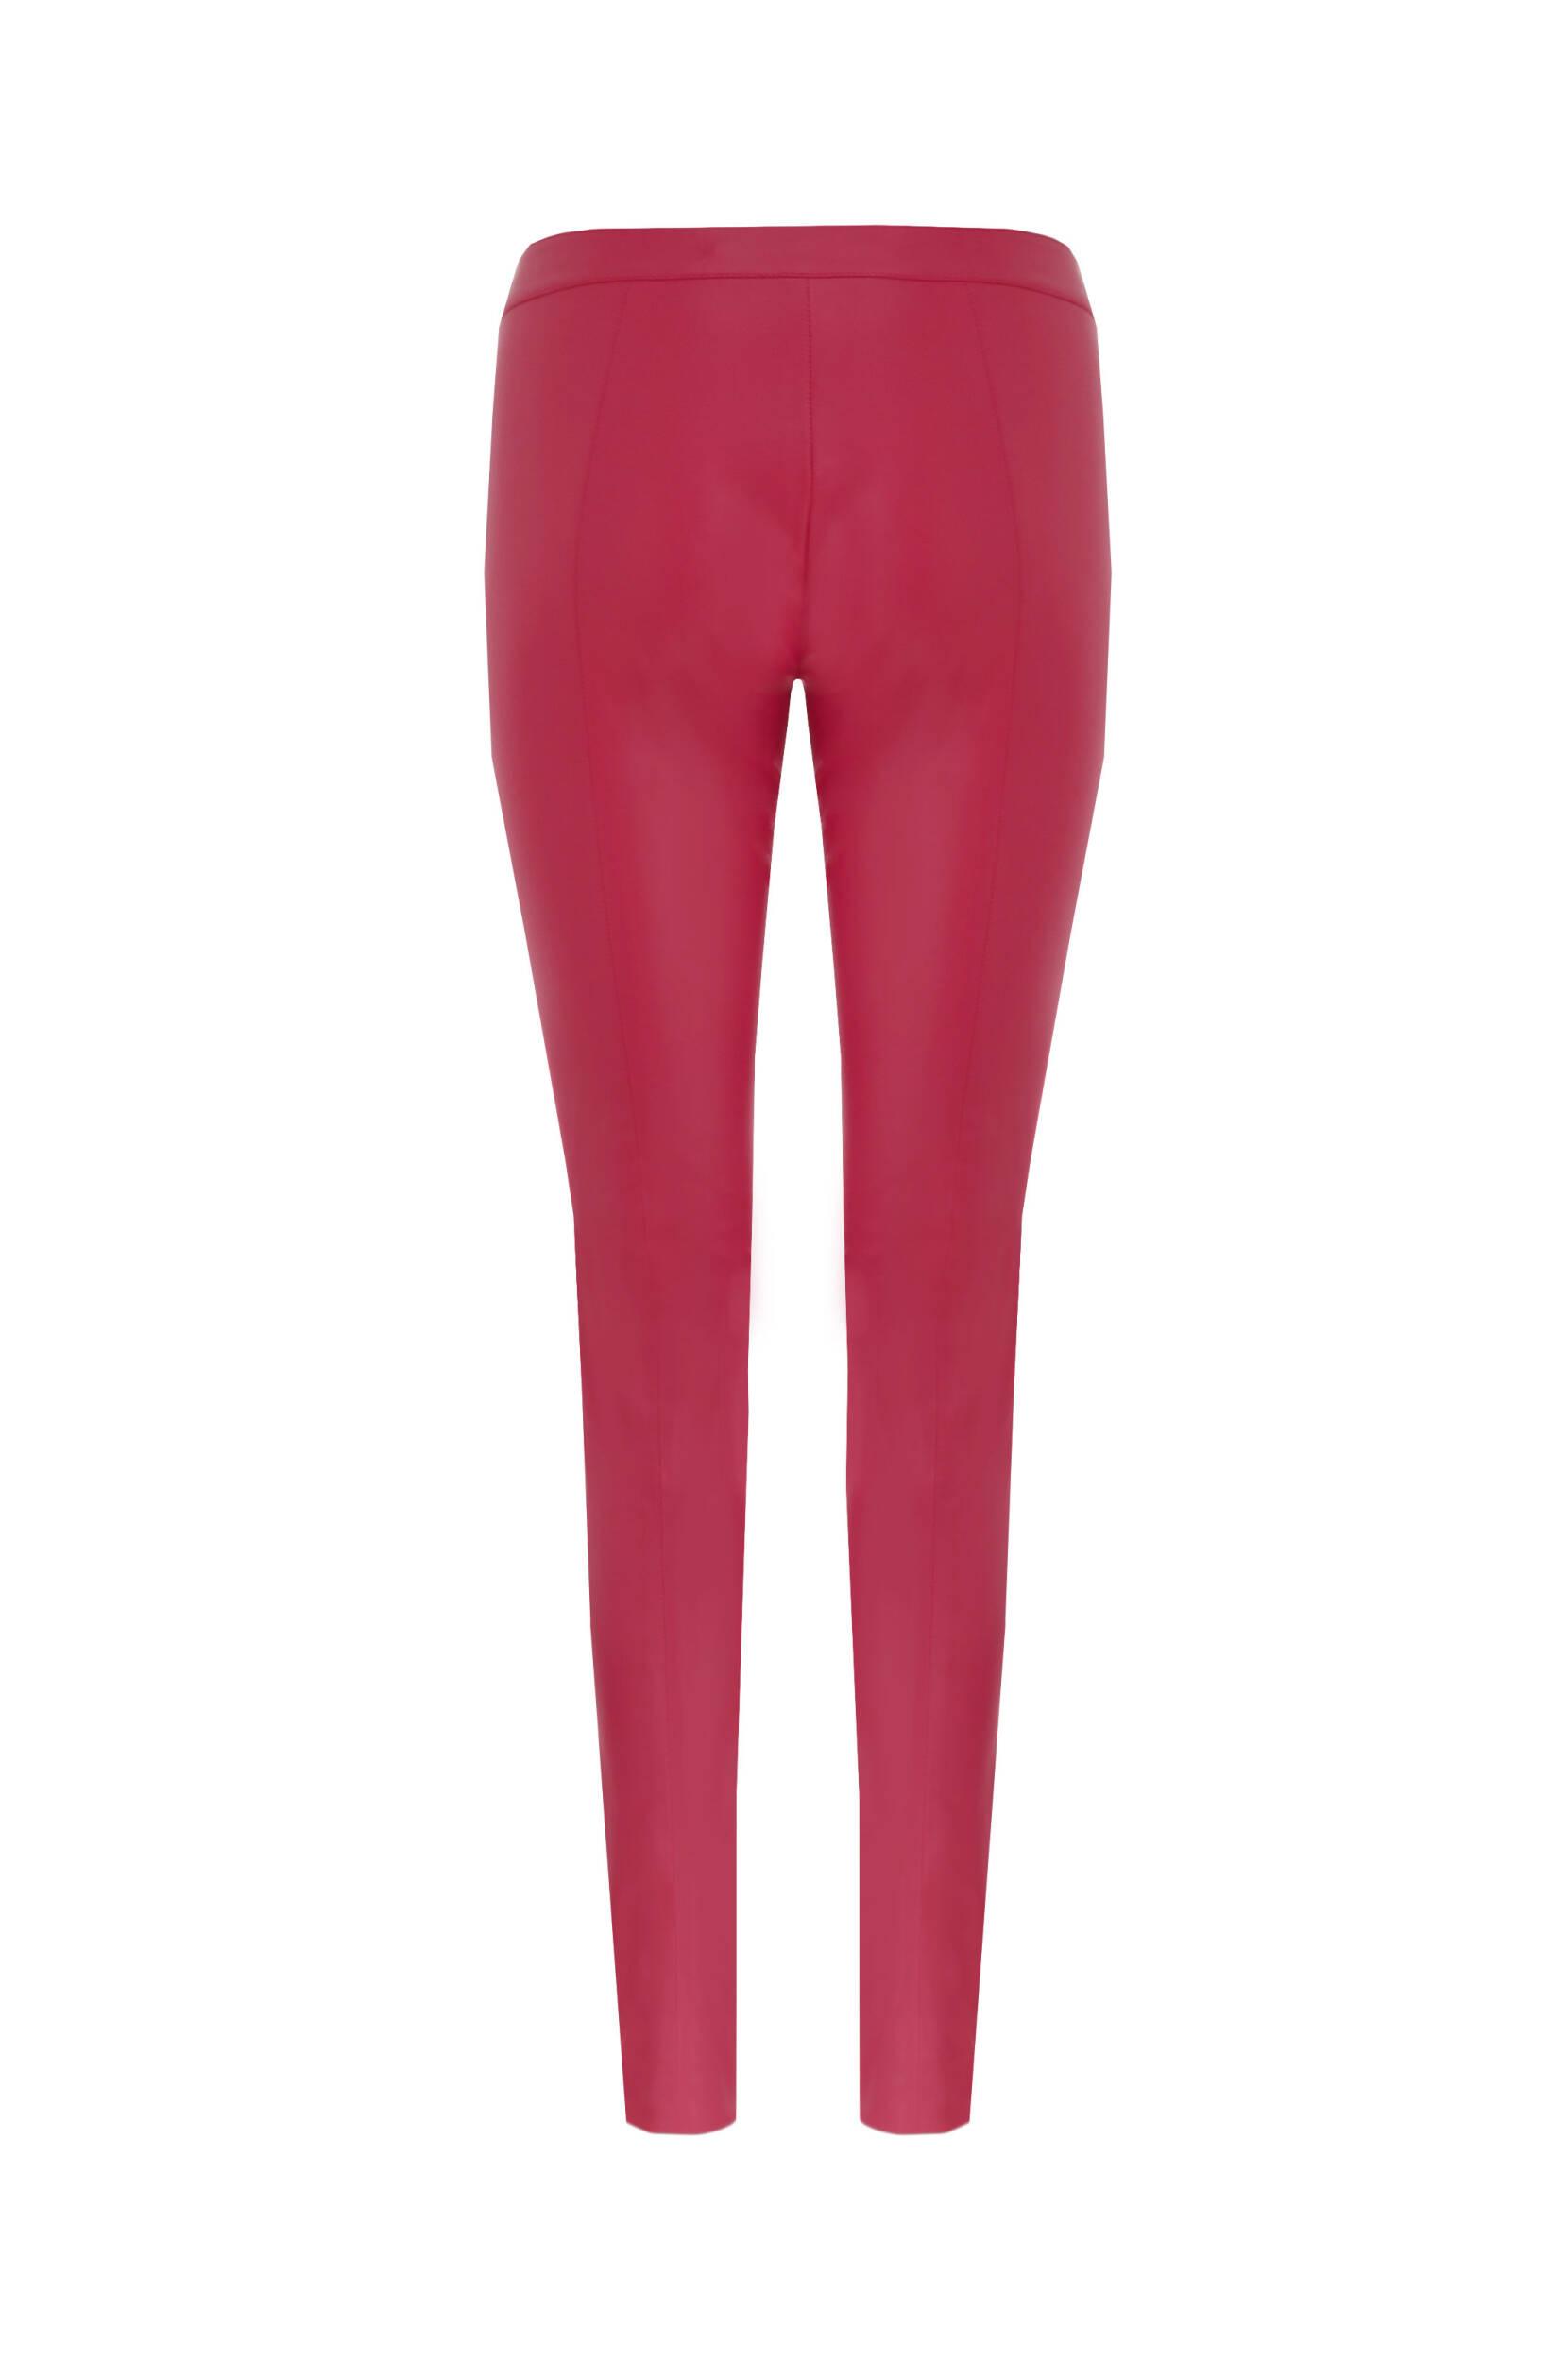 23755e8e116844 Legginsy Tabitha Guess Jeans | Różowy | Gomez.pl